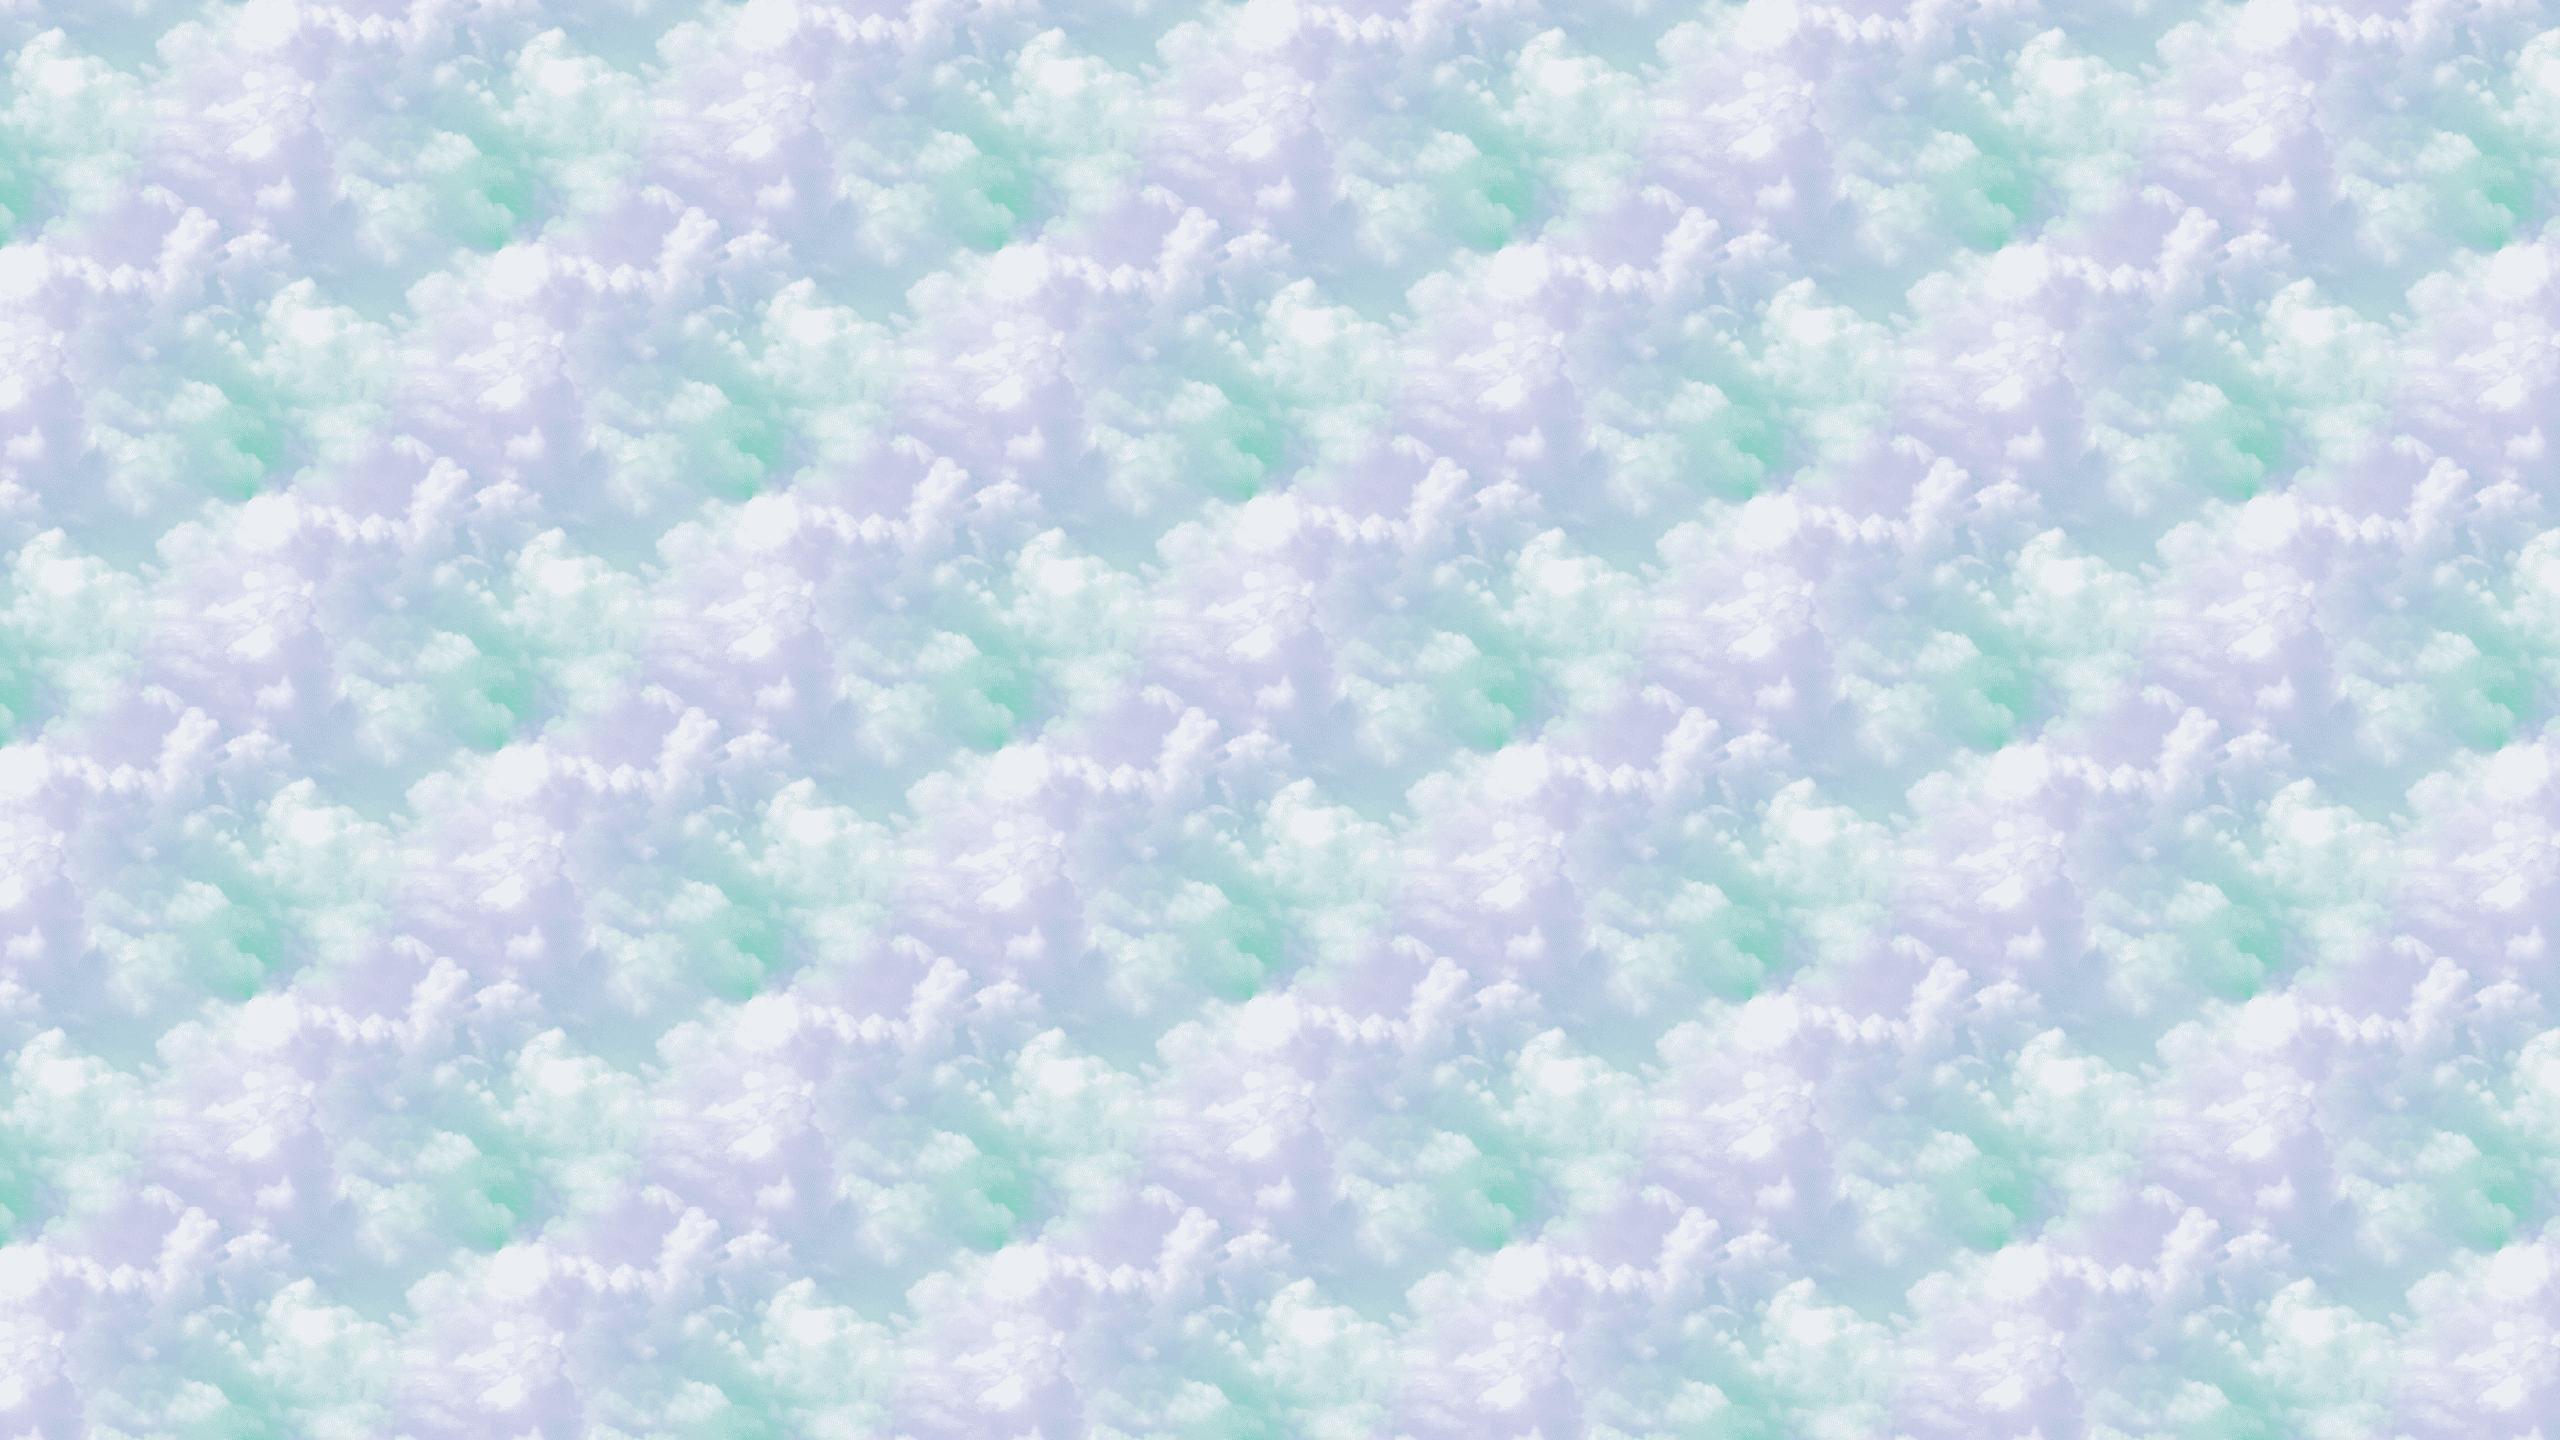 Pastel Clouds Tumblr Background Pastel clouds desktop | Platser ... for Background Pattern Tumblr Blue  143gtk